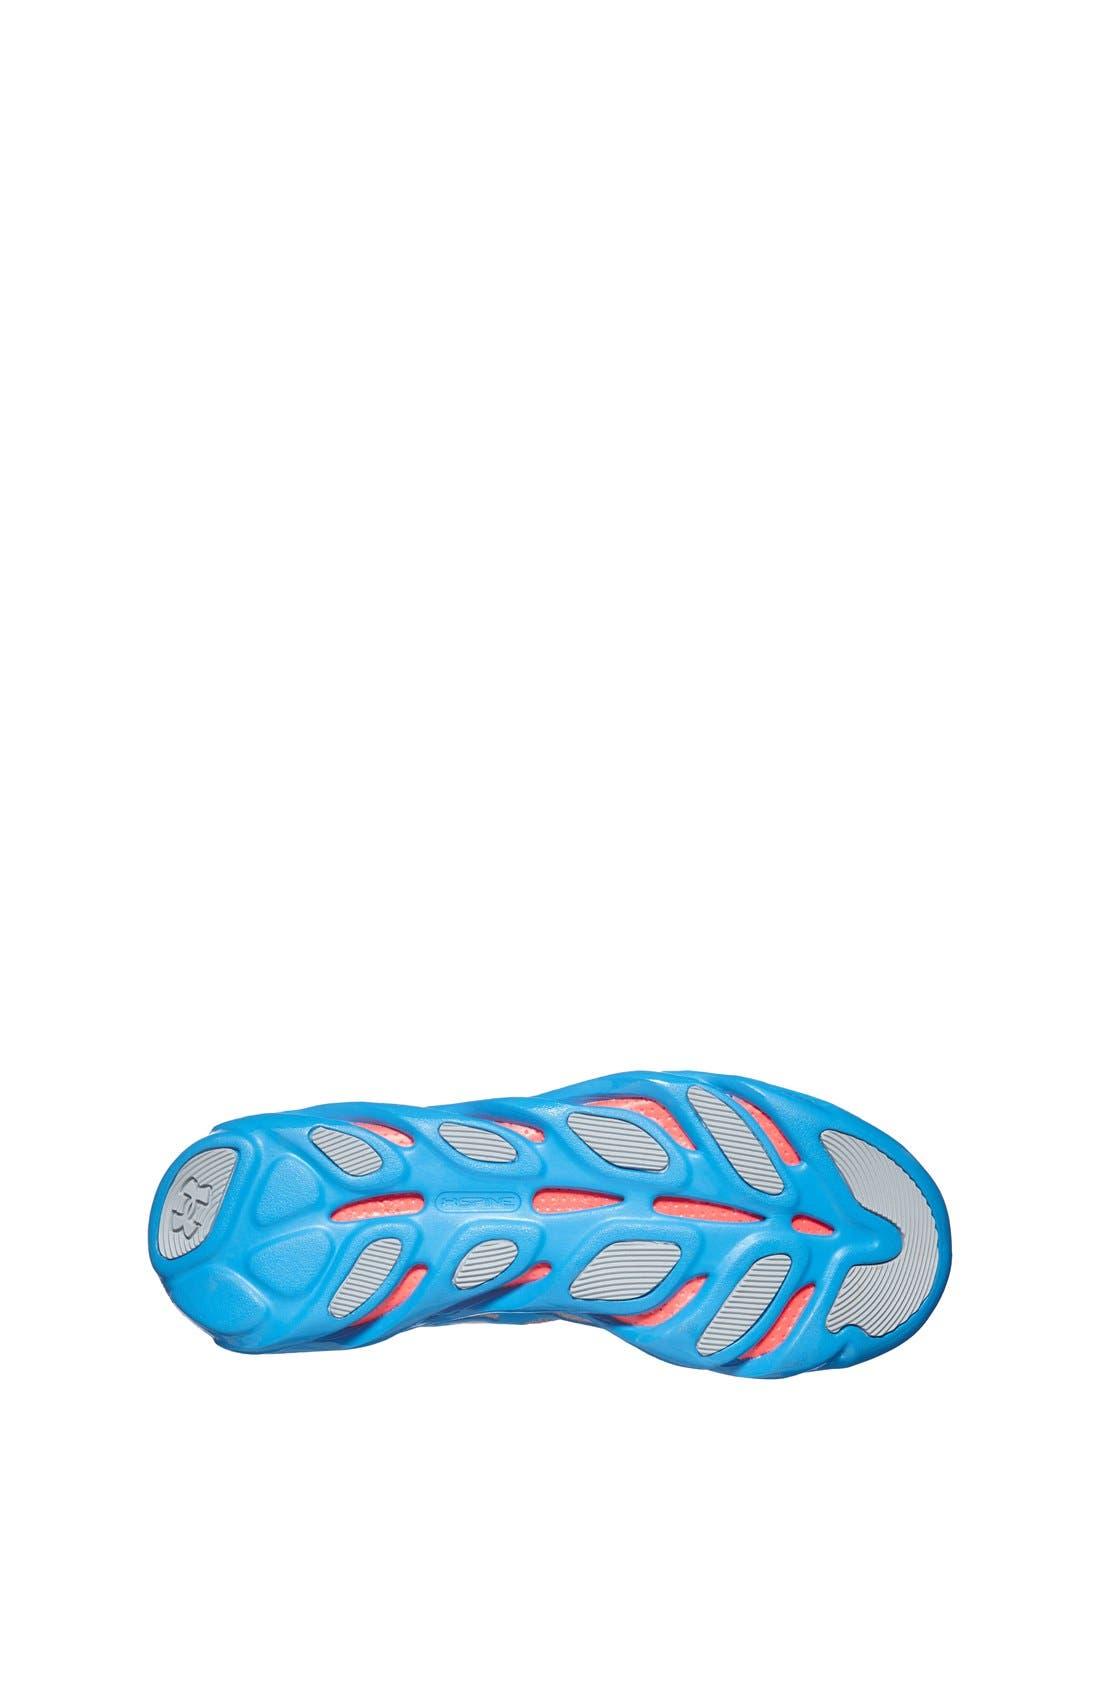 Alternate Image 4  - Under Armour 'Spine' Athletic Shoe (Big Kid)